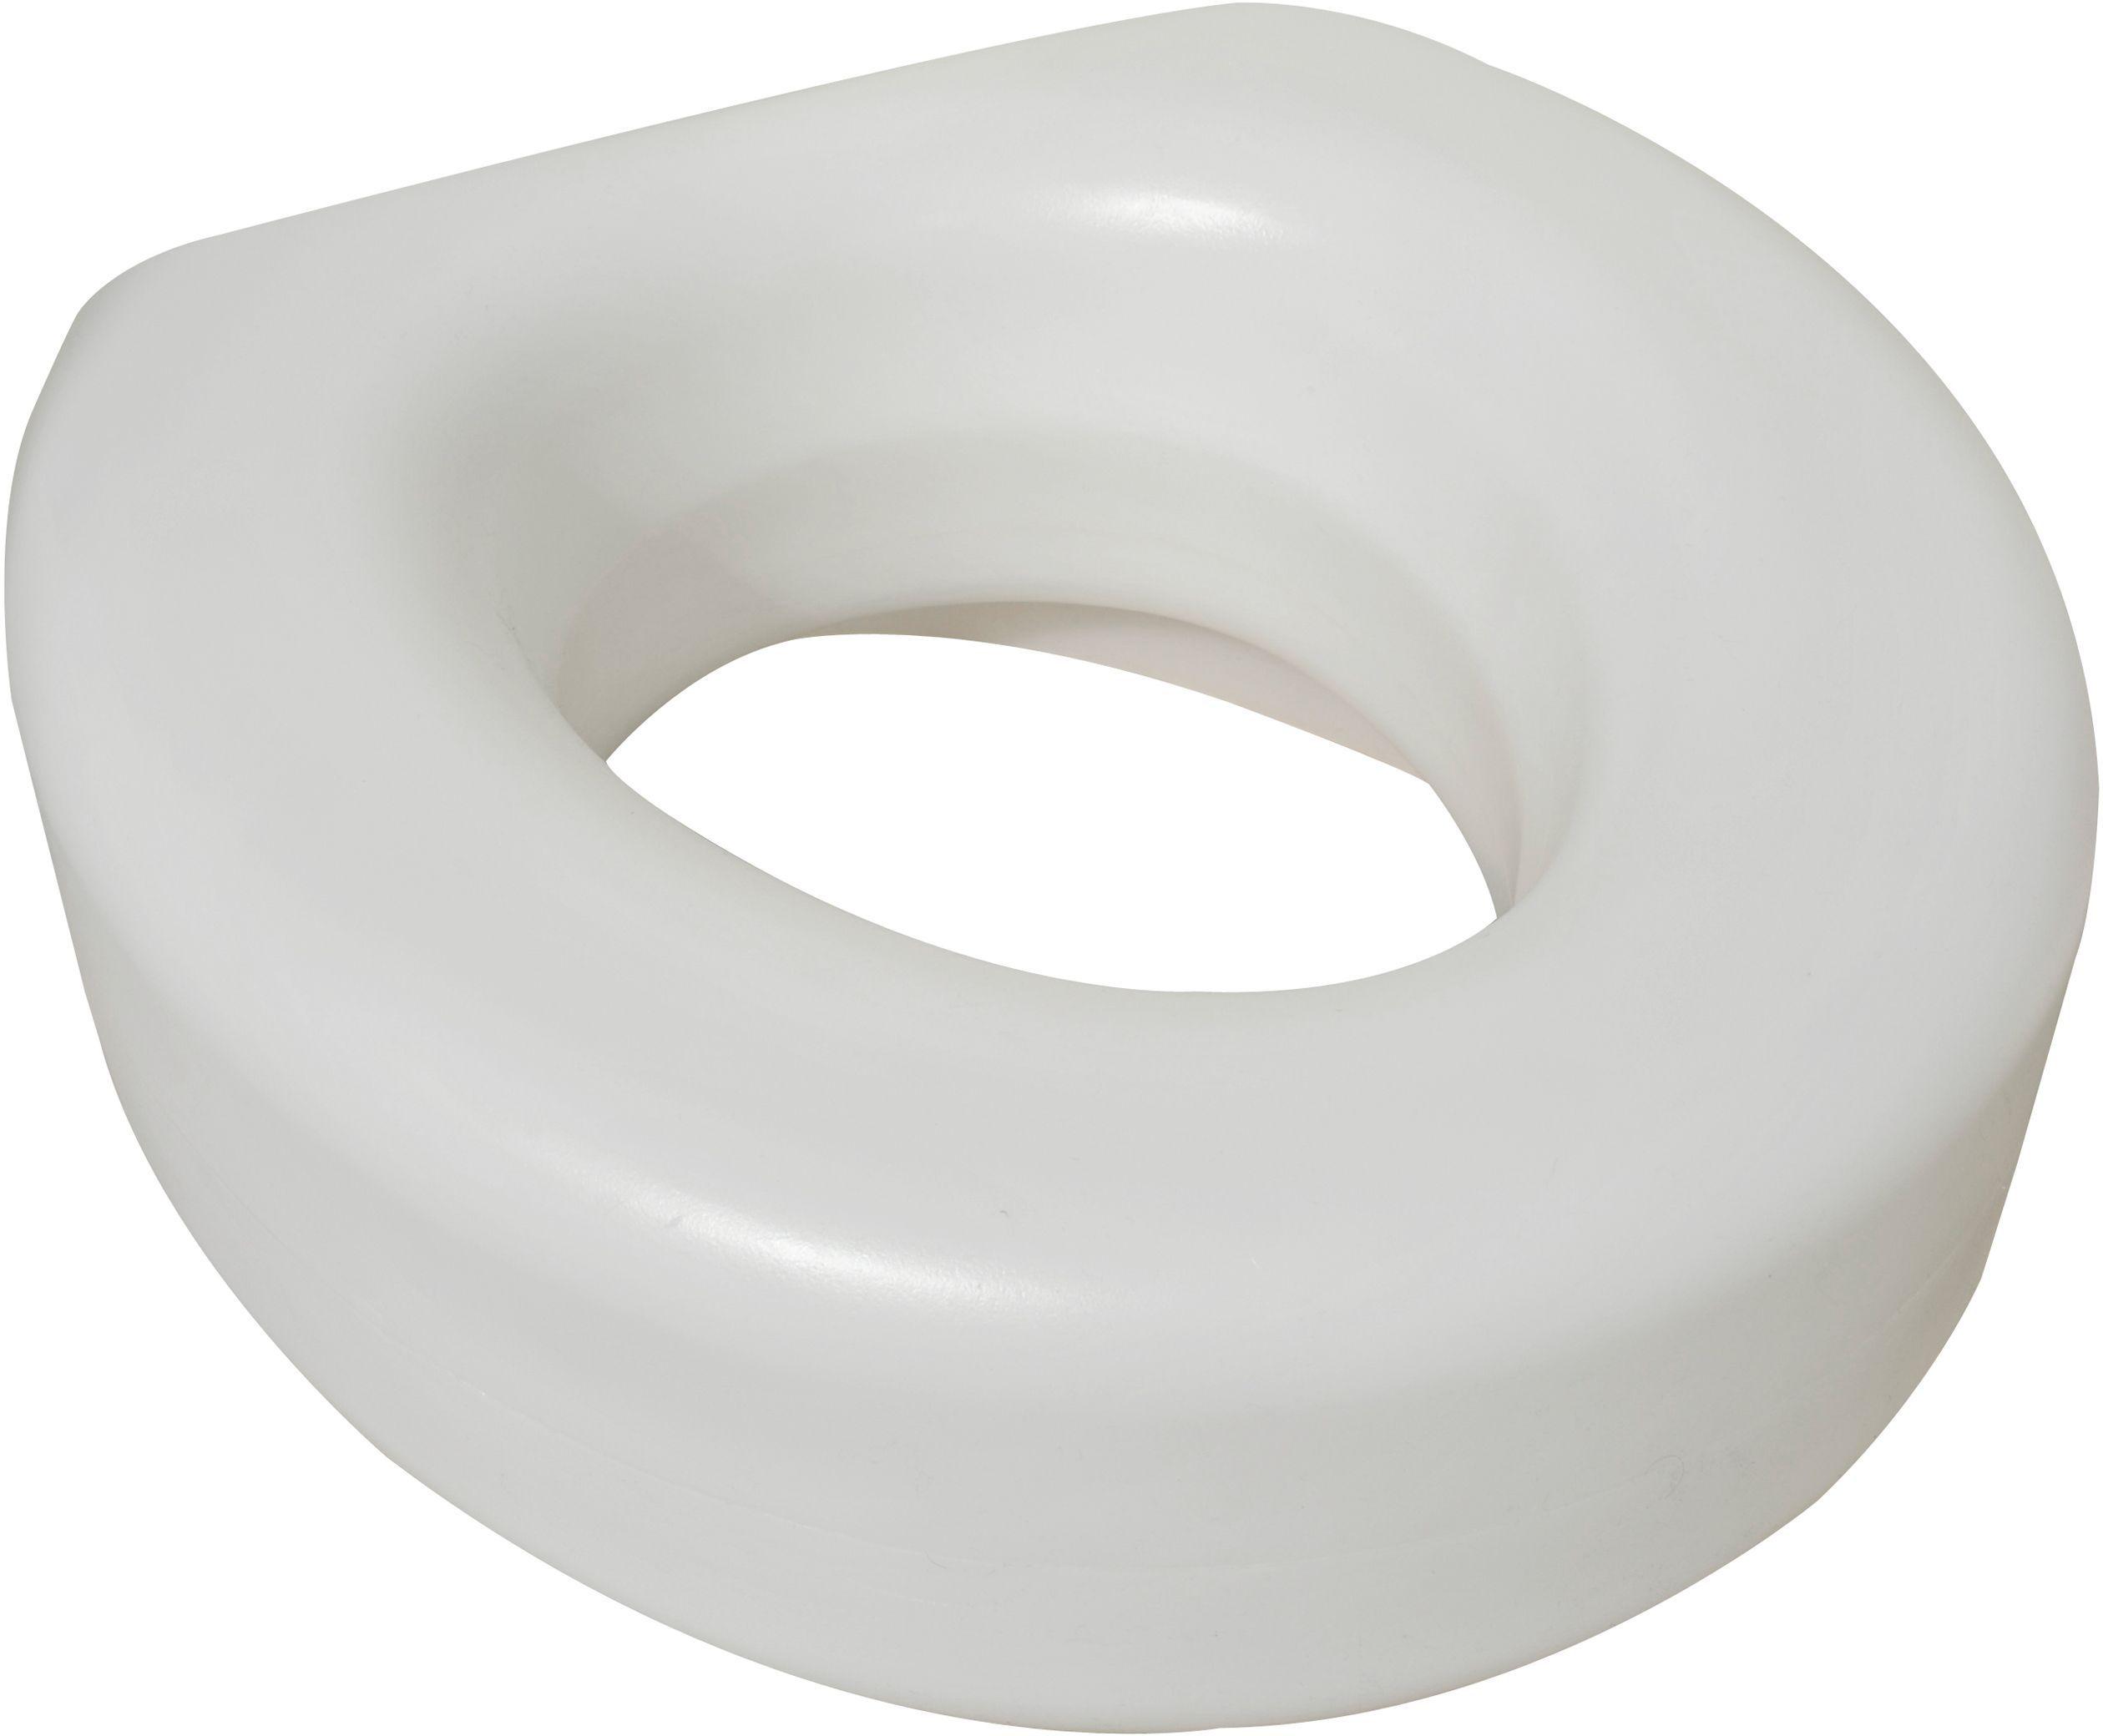 Bemis White Toilet Seat Fitting Departments DIY At B Q